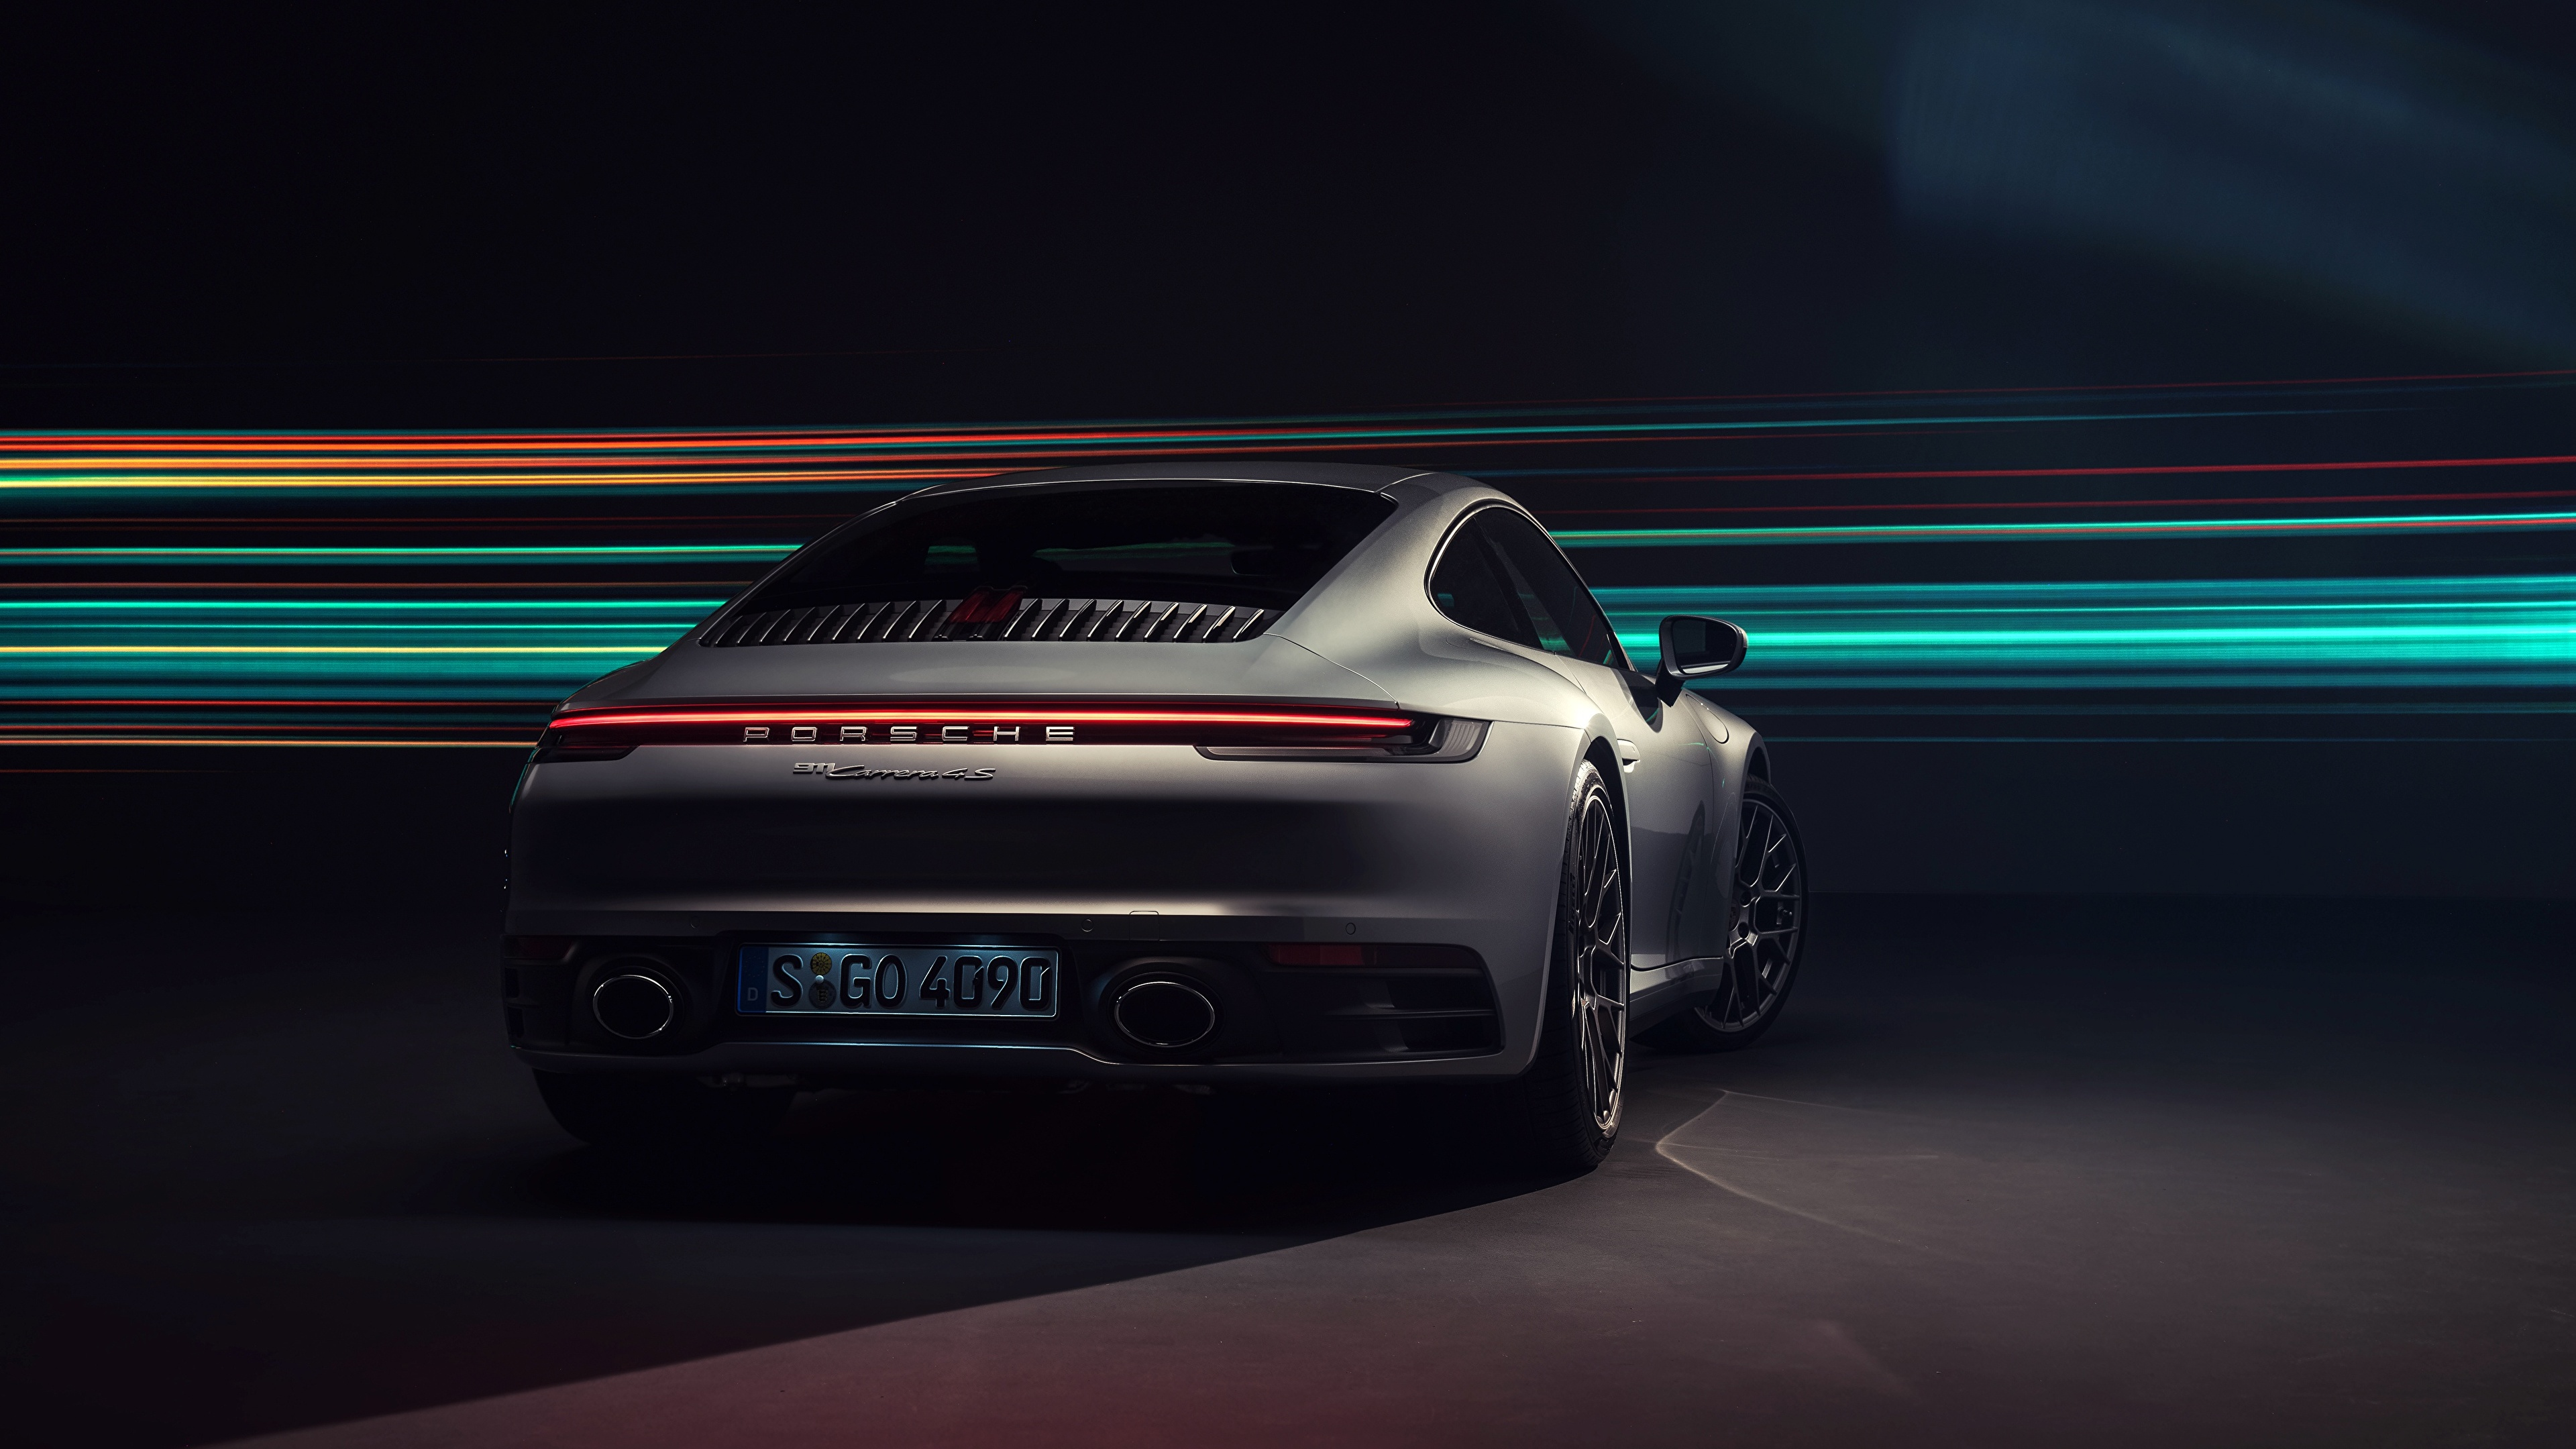 Wallpaper Porsche 911 Carrera 4S 2019 Back view automobile 3840x2160 3840x2160